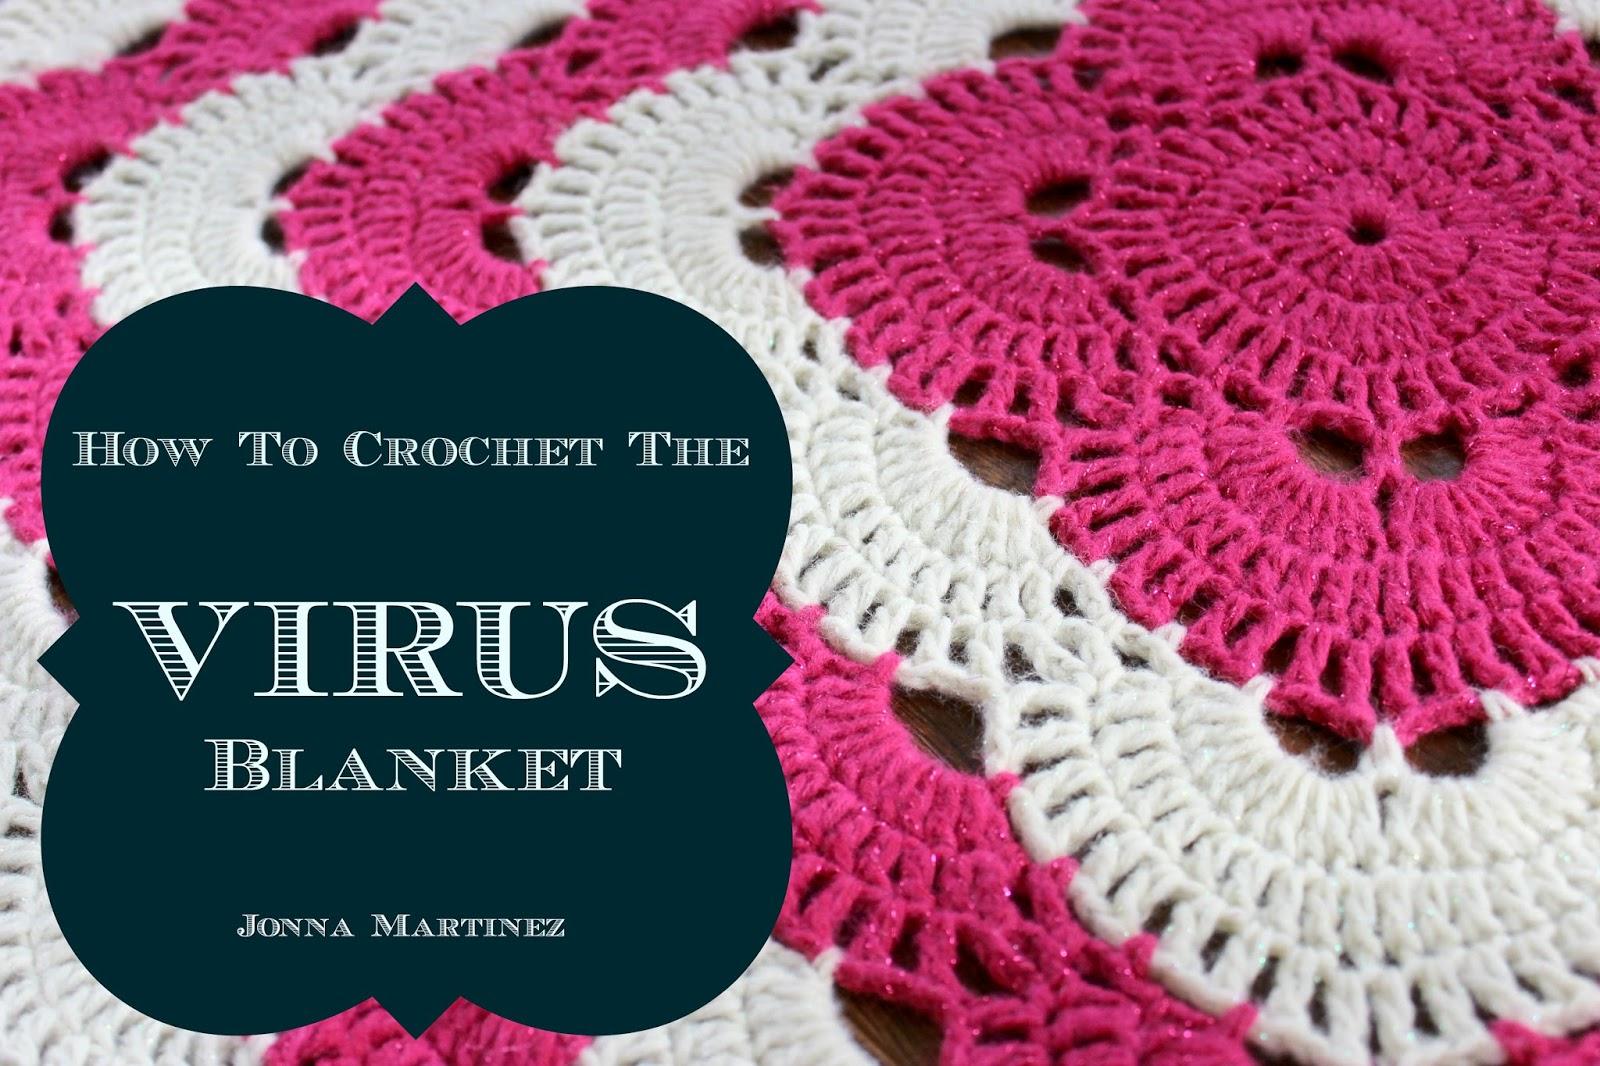 Jonna Martinez: Crochet Virus Blanket Pattern